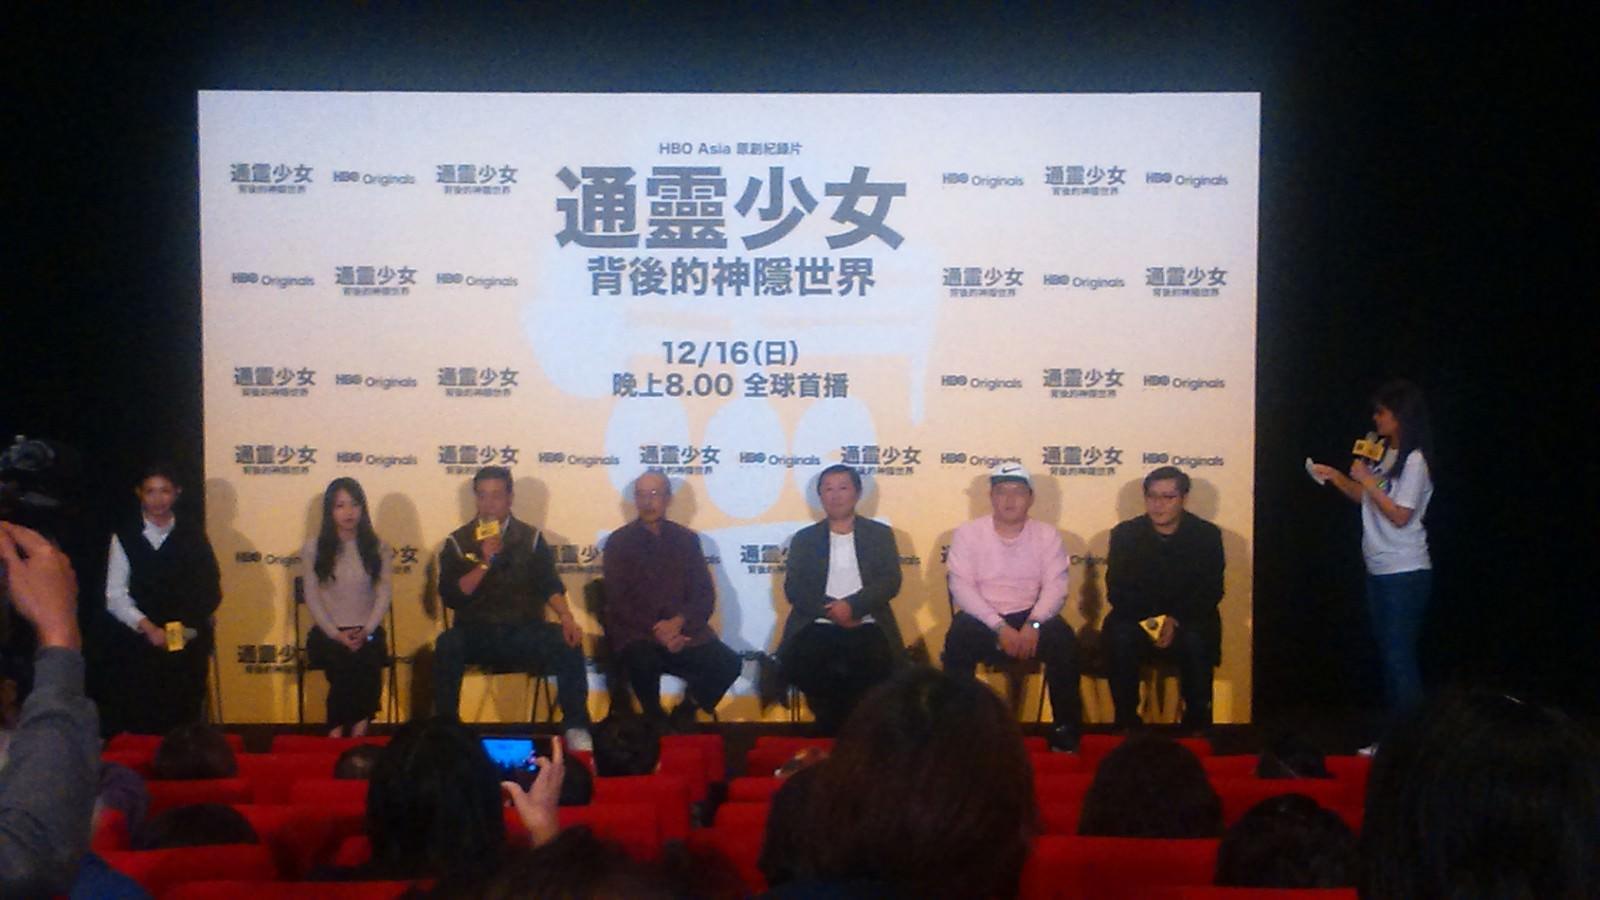 Movie, 通靈少女背後的神隱世界(台灣, 2018年) / The World Behind the Teenage Psychic(英文), 特映會(首映會), 紀錄對象訪談